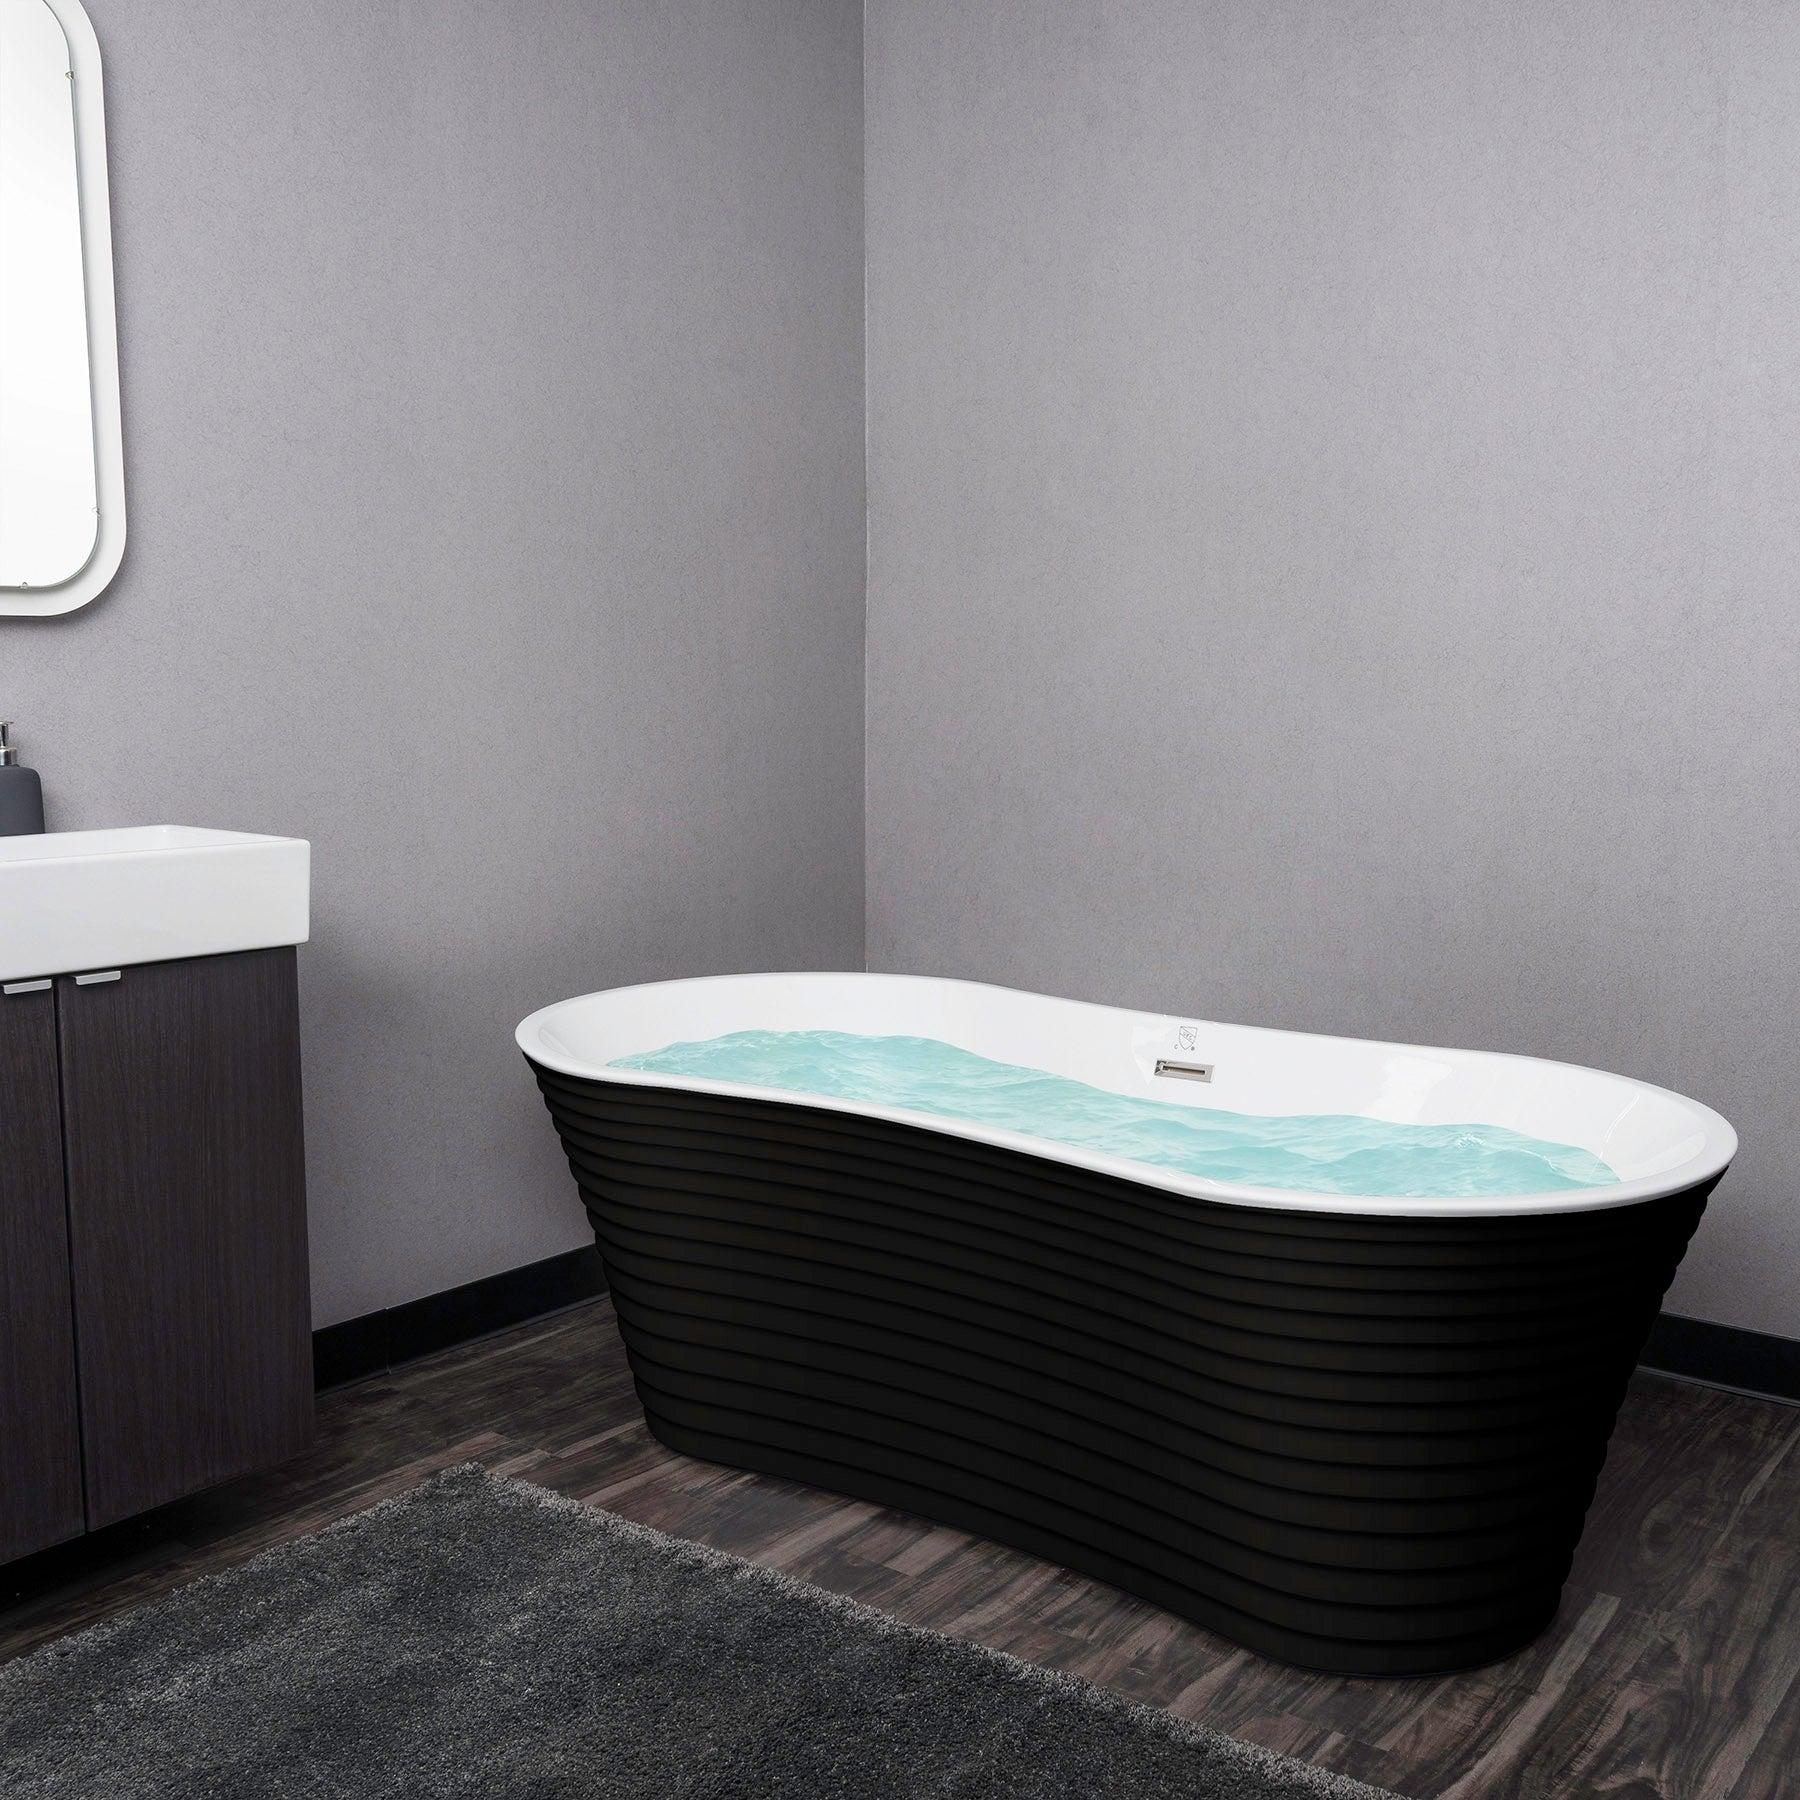 AKDY 67 White Black Acrylic Freestanding Soaking SPA Bathroom Oval Bathtub Overflow